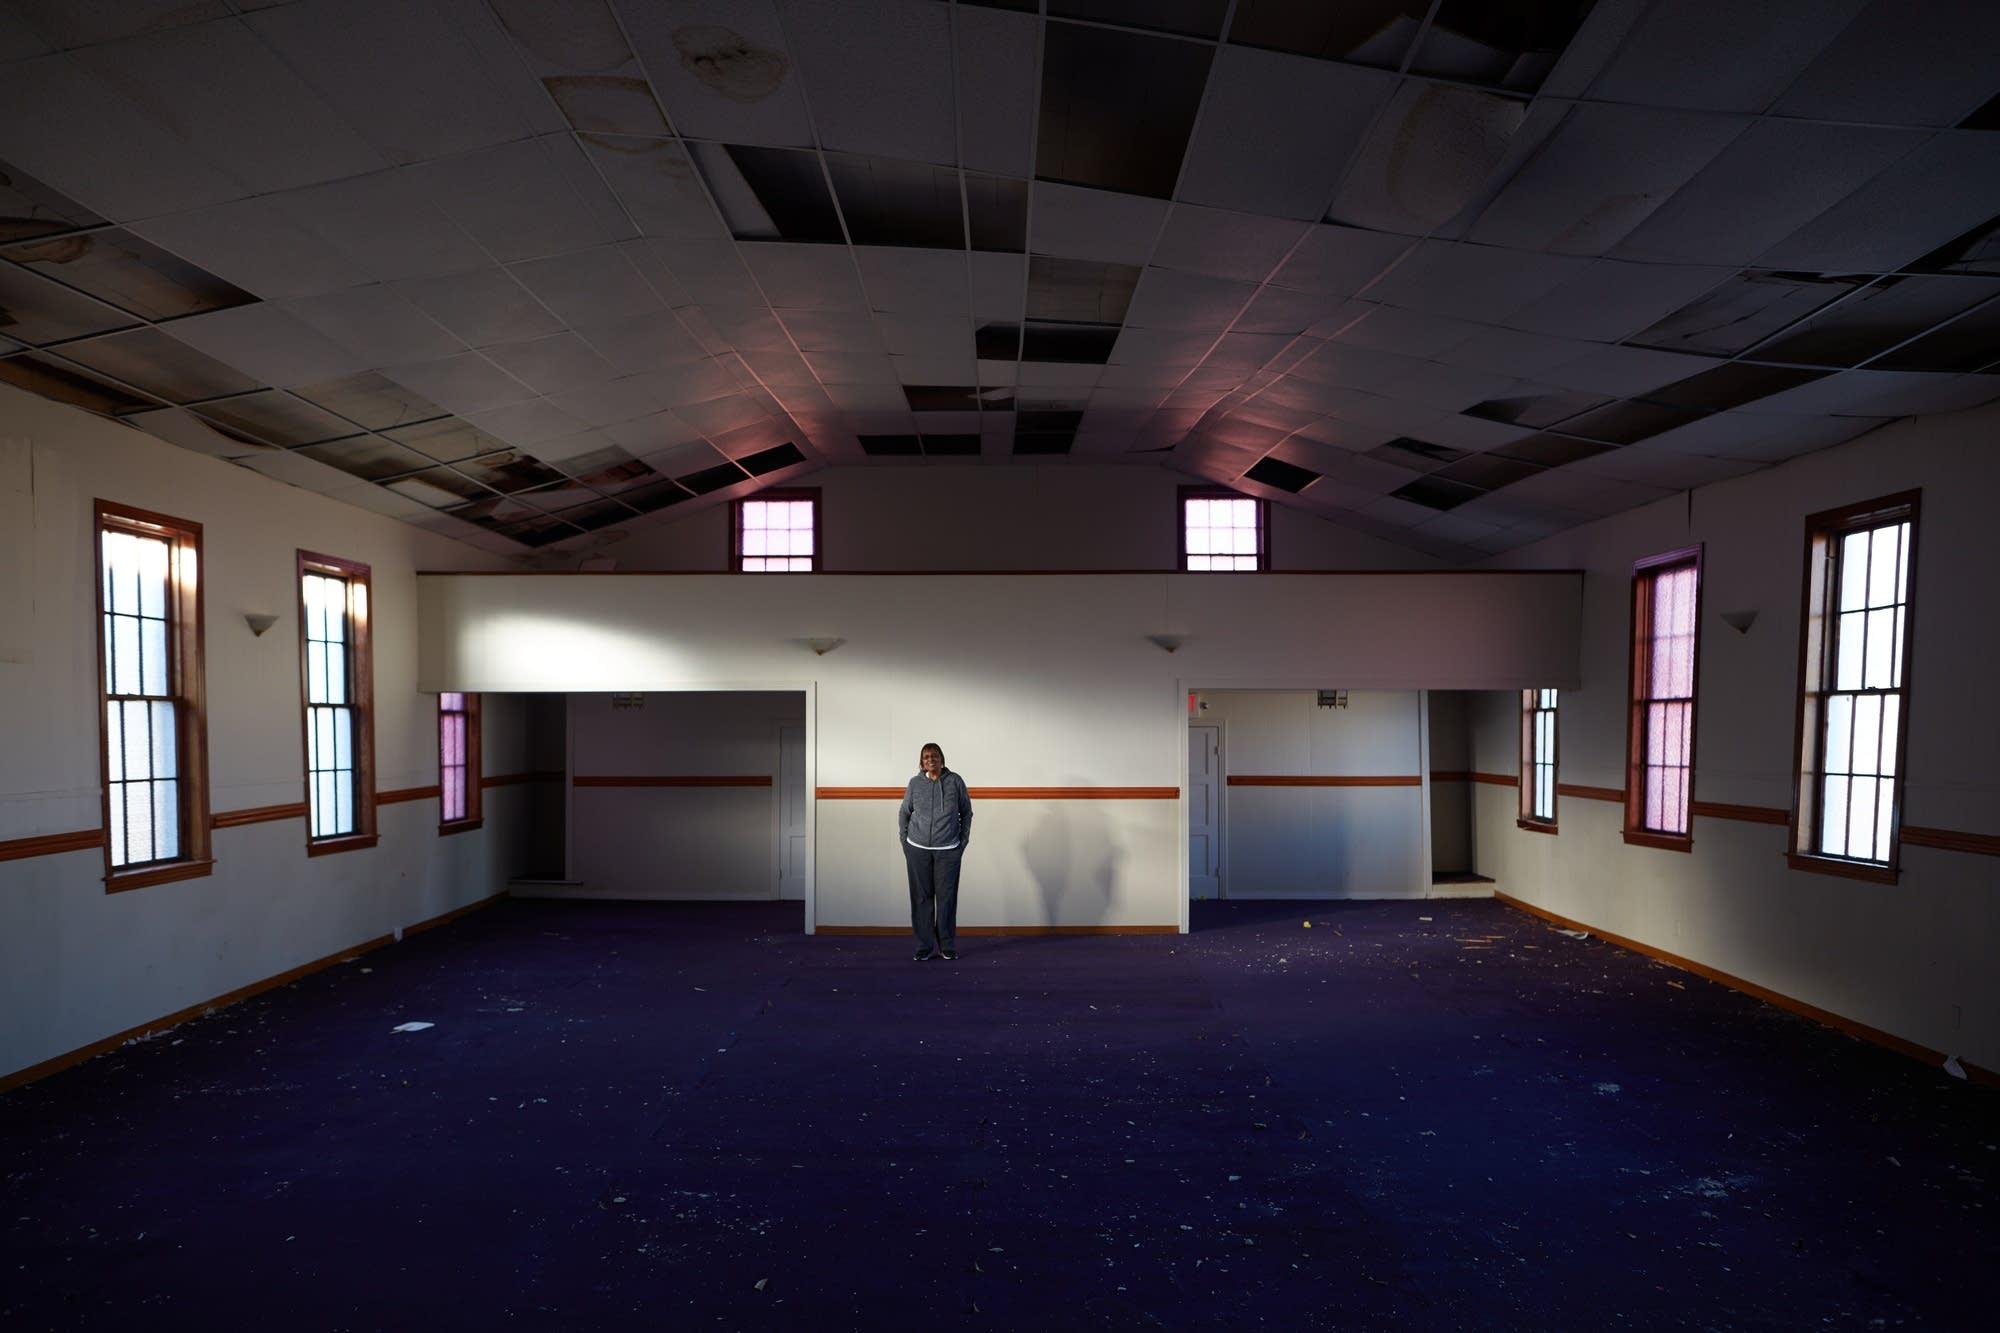 Estella Cox Williamson, Belle Flower Missionary Baptist Church